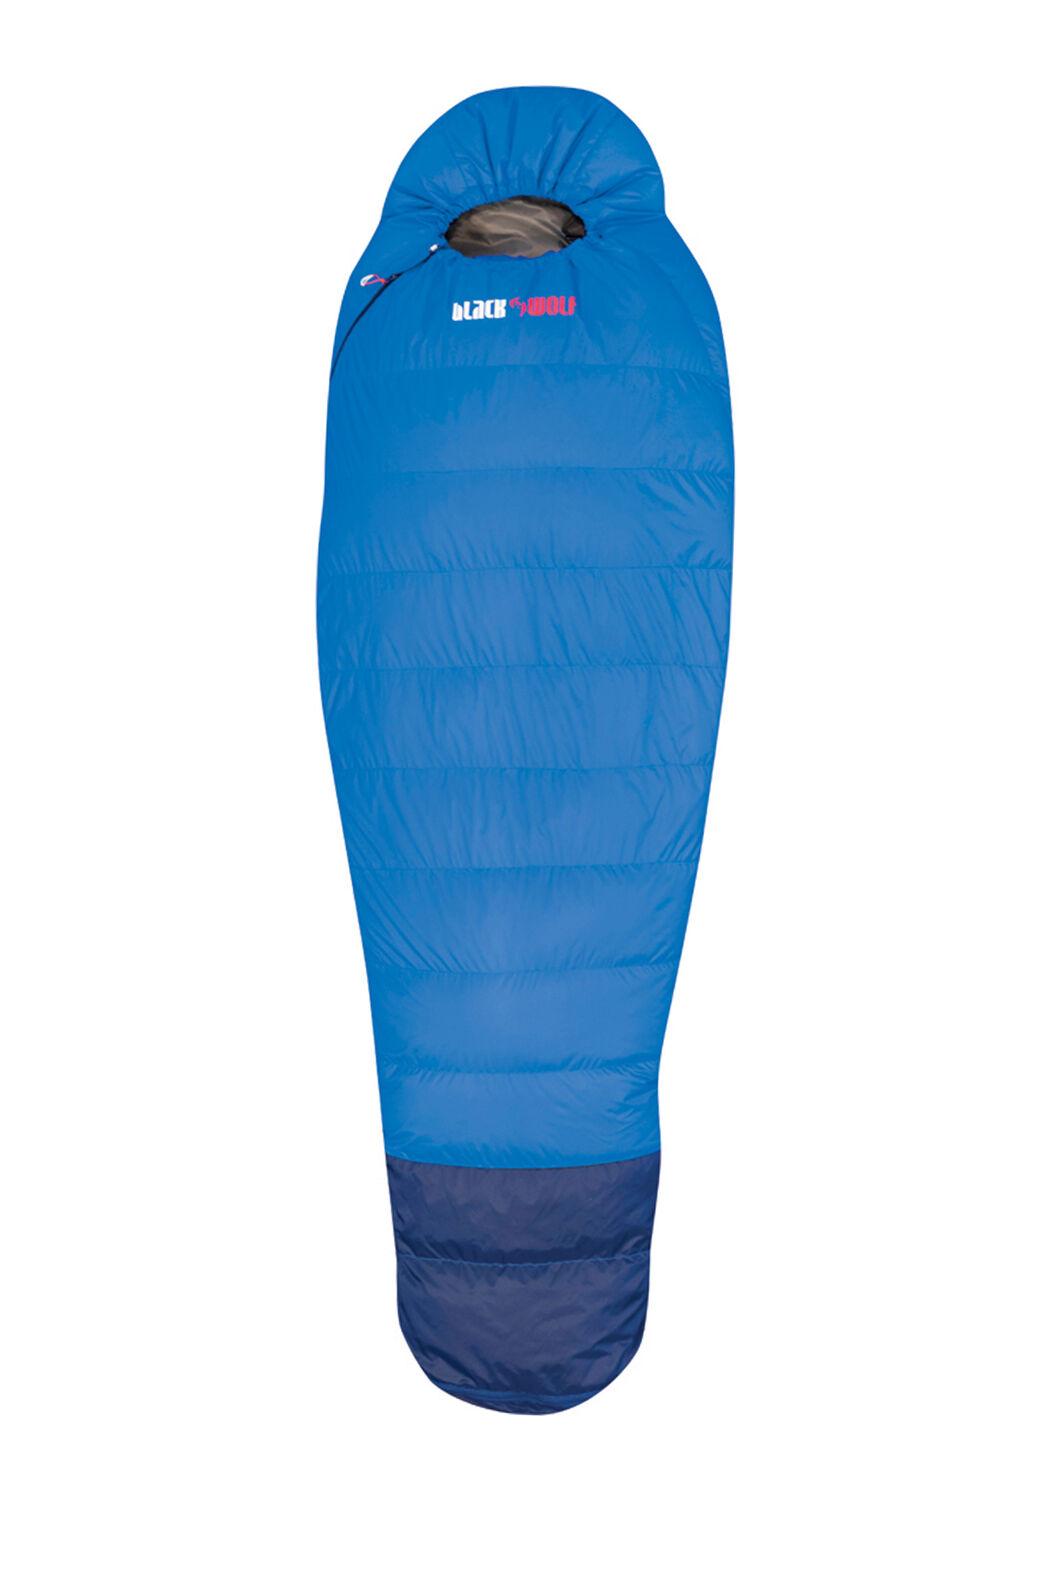 BlackWolf Hiker 500 Sleeping Bag, None, hi-res